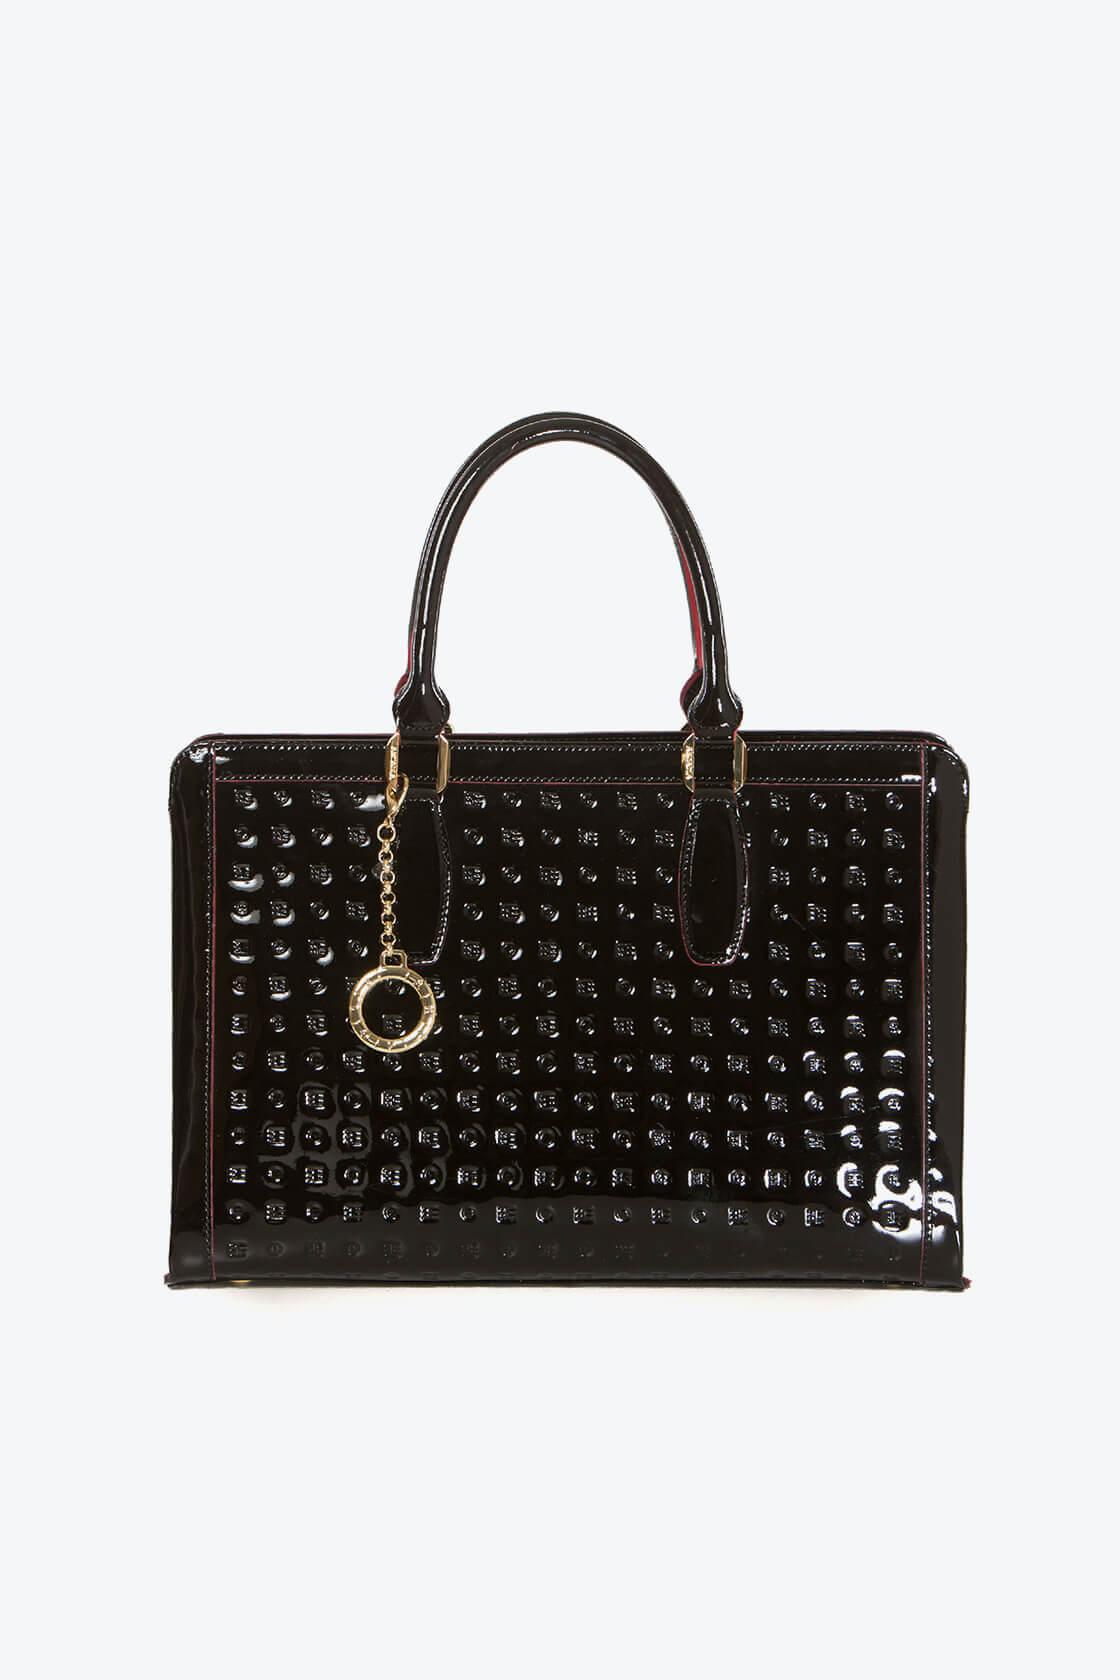 ol80000250 business large top handles bag 1